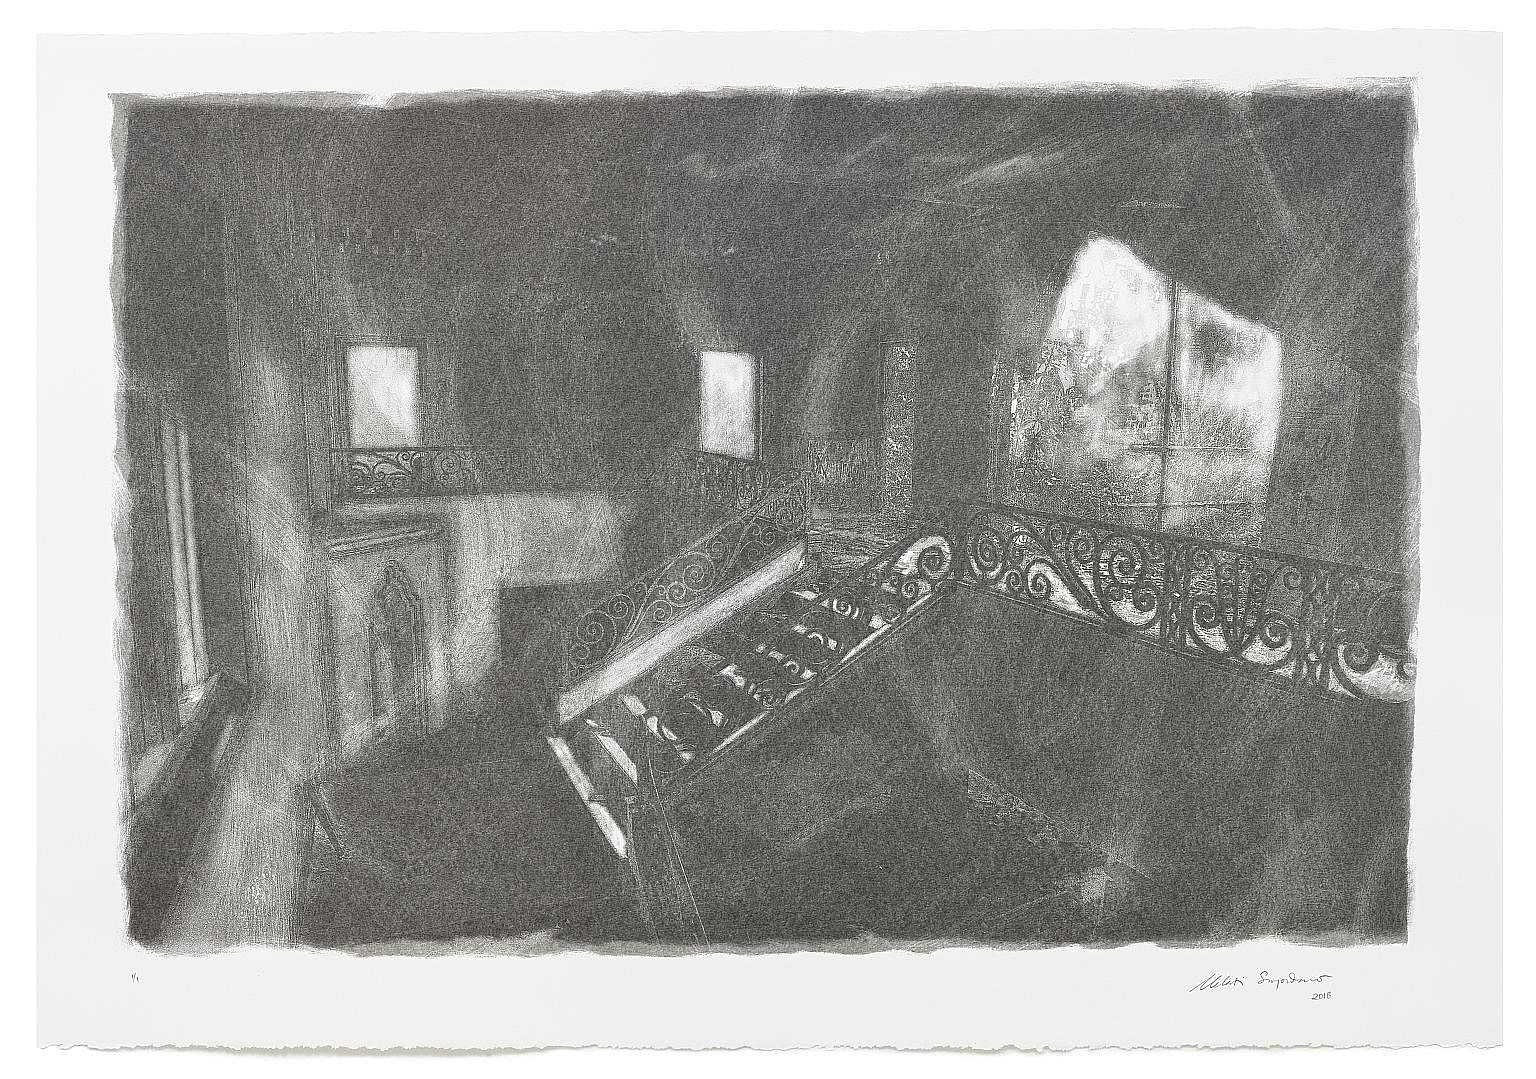 Phosphenes 2 (2018), screenprint with charcoal powder on paper. Performance titled Vestige at Goodman B-Sides 2018.